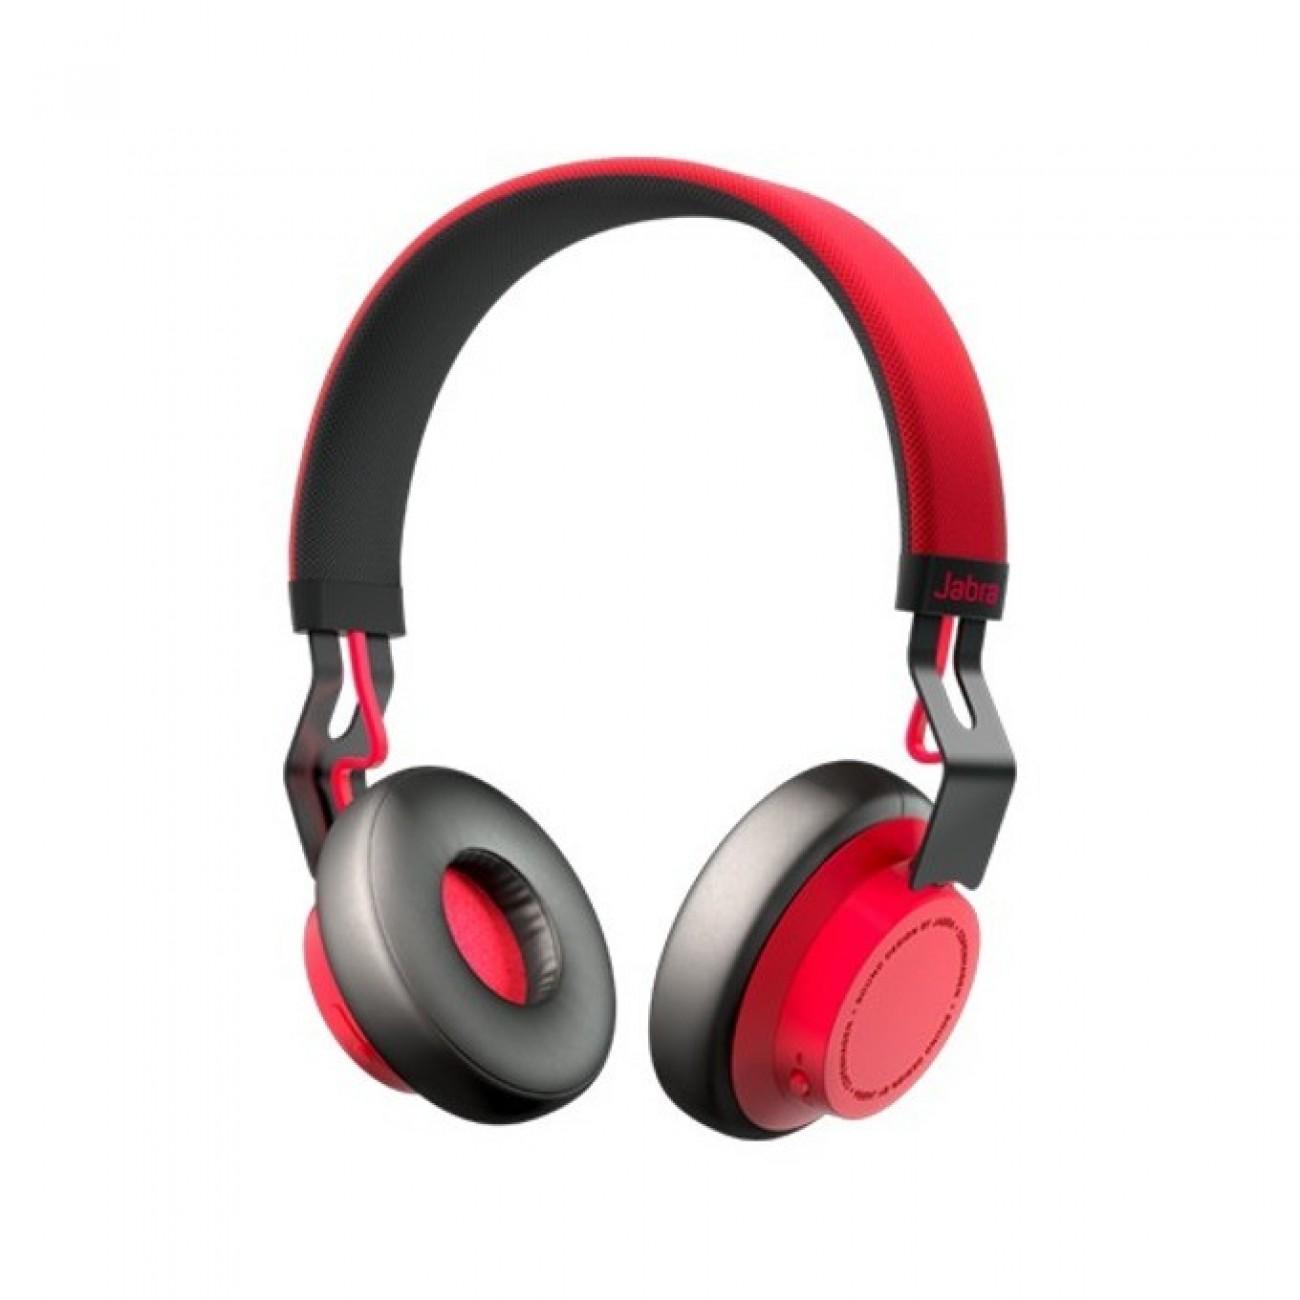 Слушалки, Блутут слушалки, Jabra, Move Coal, добро качество на звука с дълбок бас, Червени в Bluetooth аксесоари и Handsfree -  | Alleop